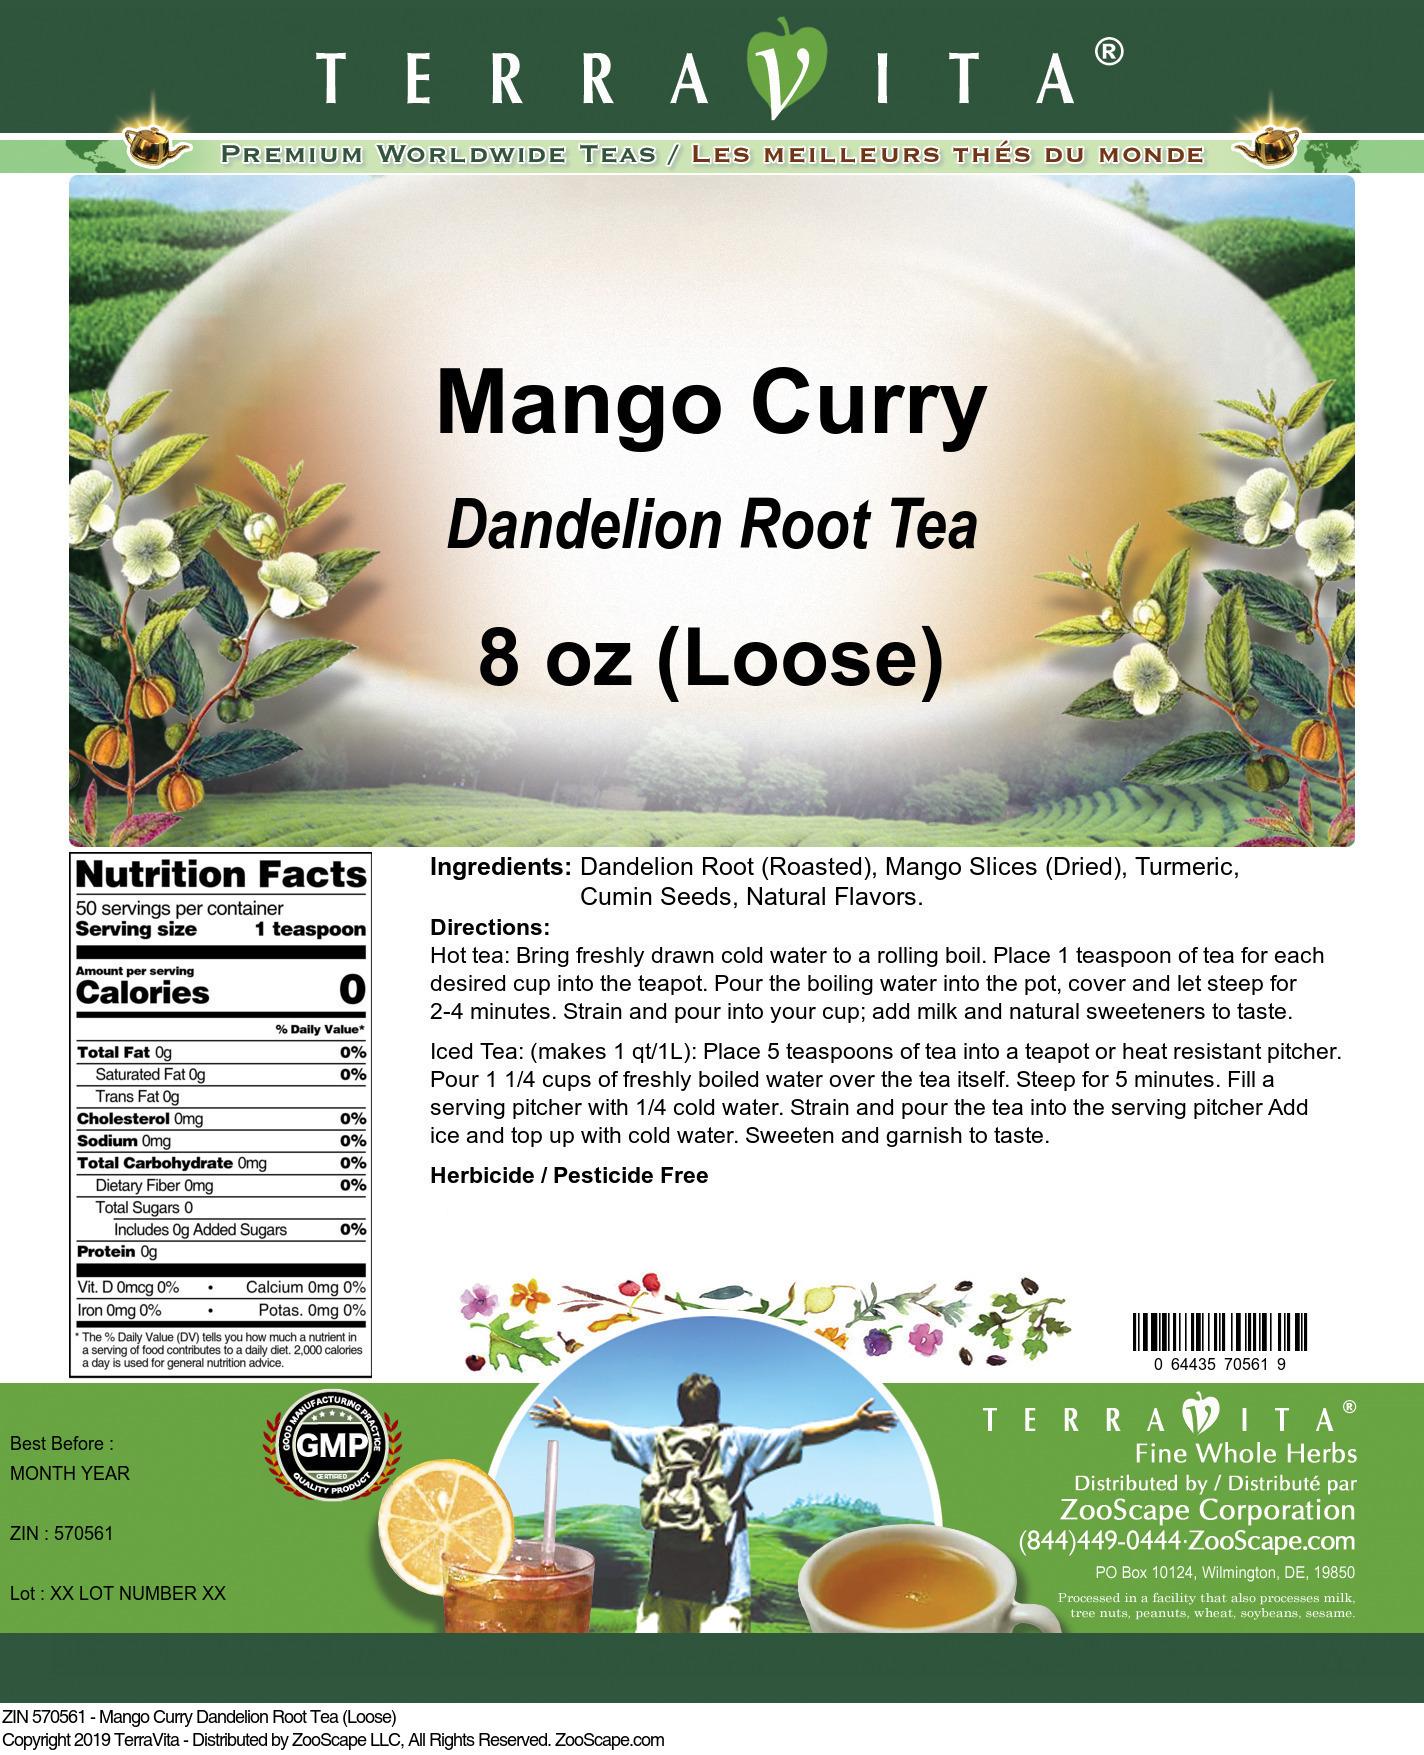 Mango Curry Dandelion Root Tea (Loose)